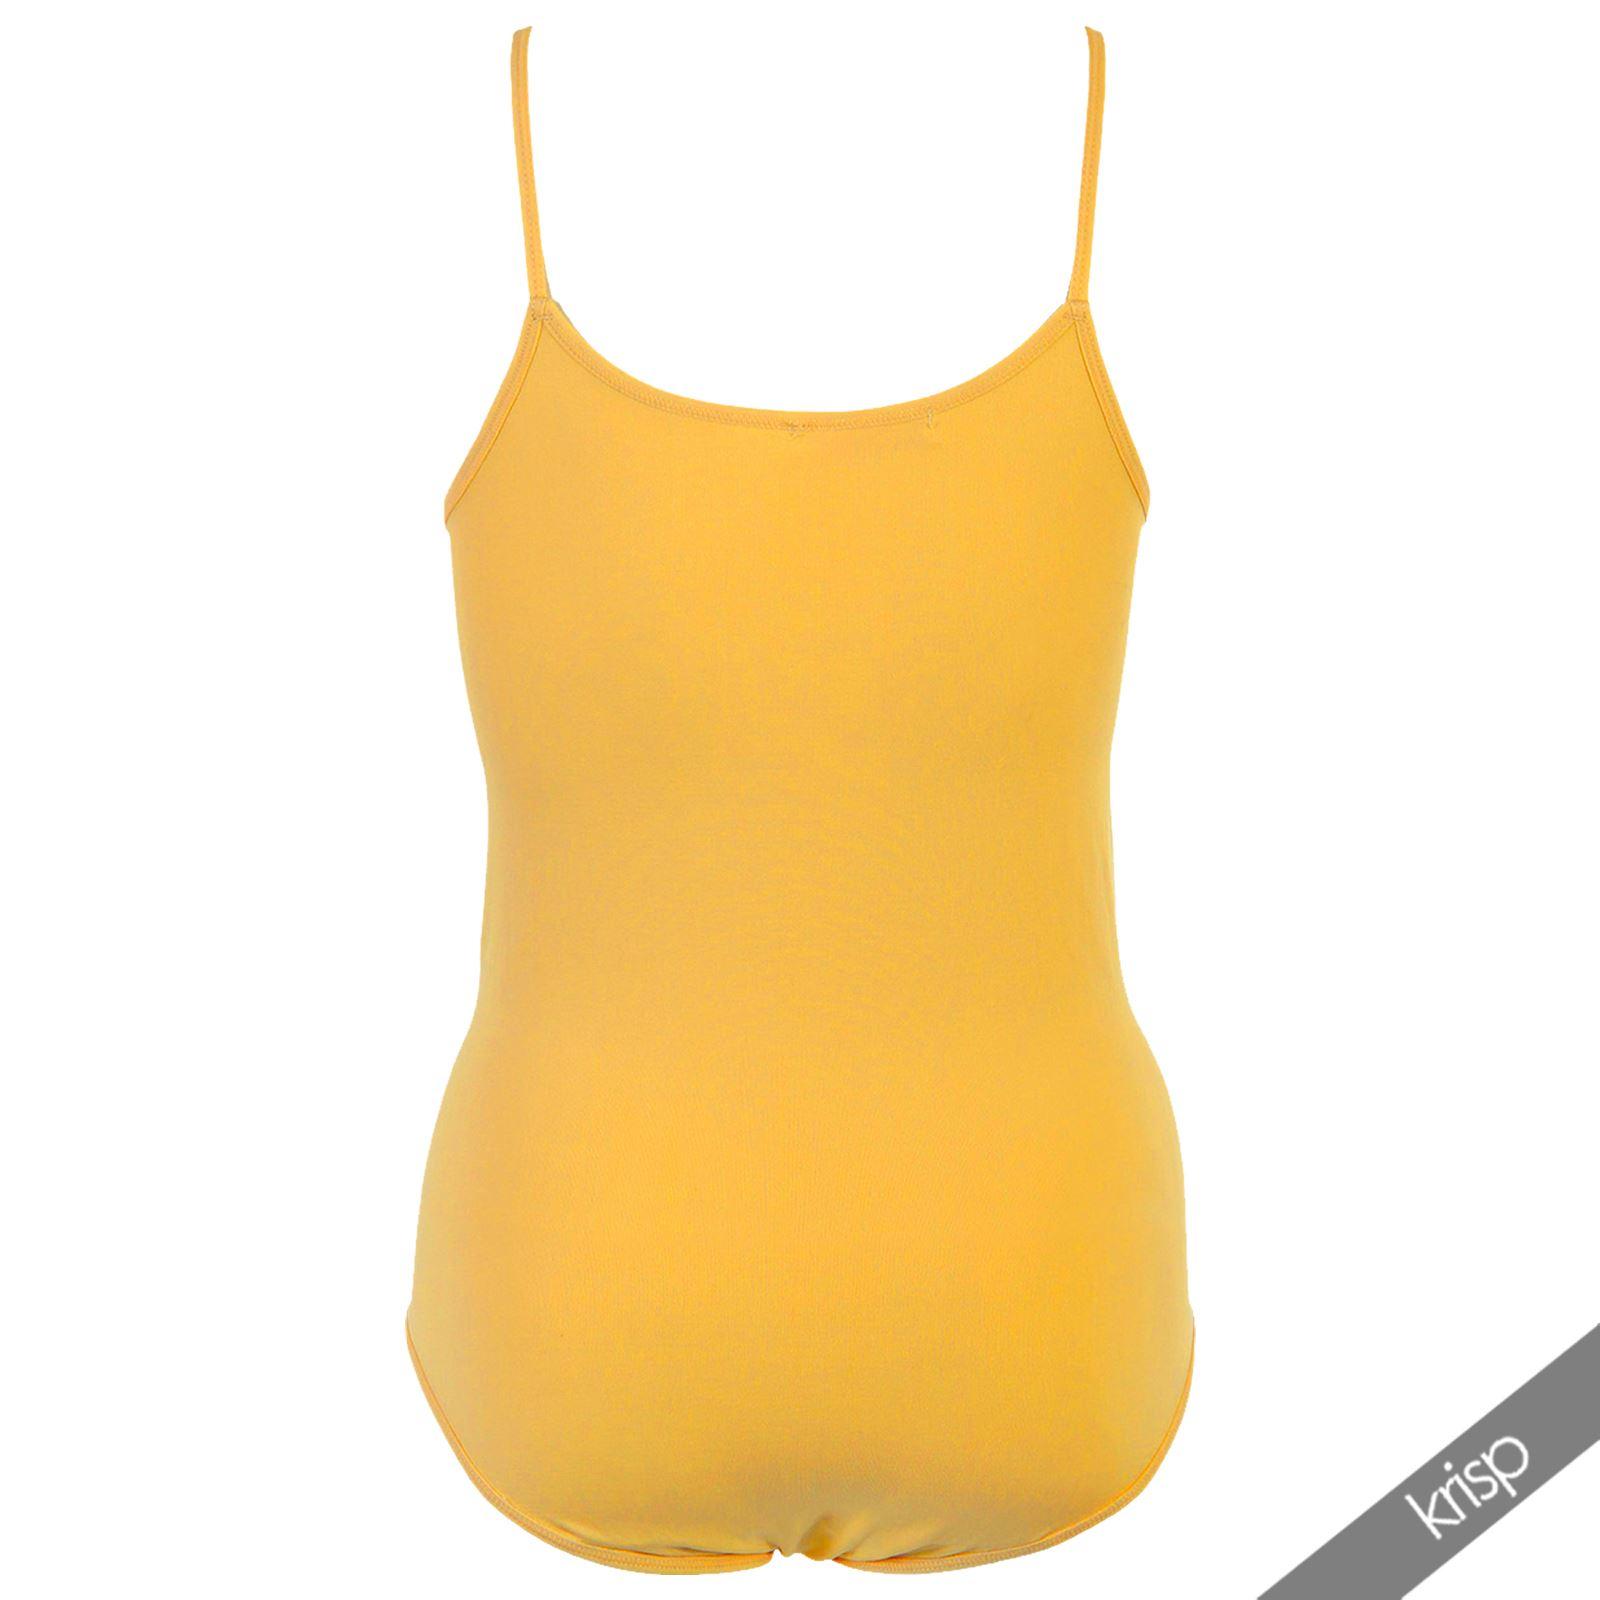 Body-Mujer-Basico-Invierno-Cuello-Barato-Top-Camiseta-Ajustado-Tirantes-Elastico miniatura 19